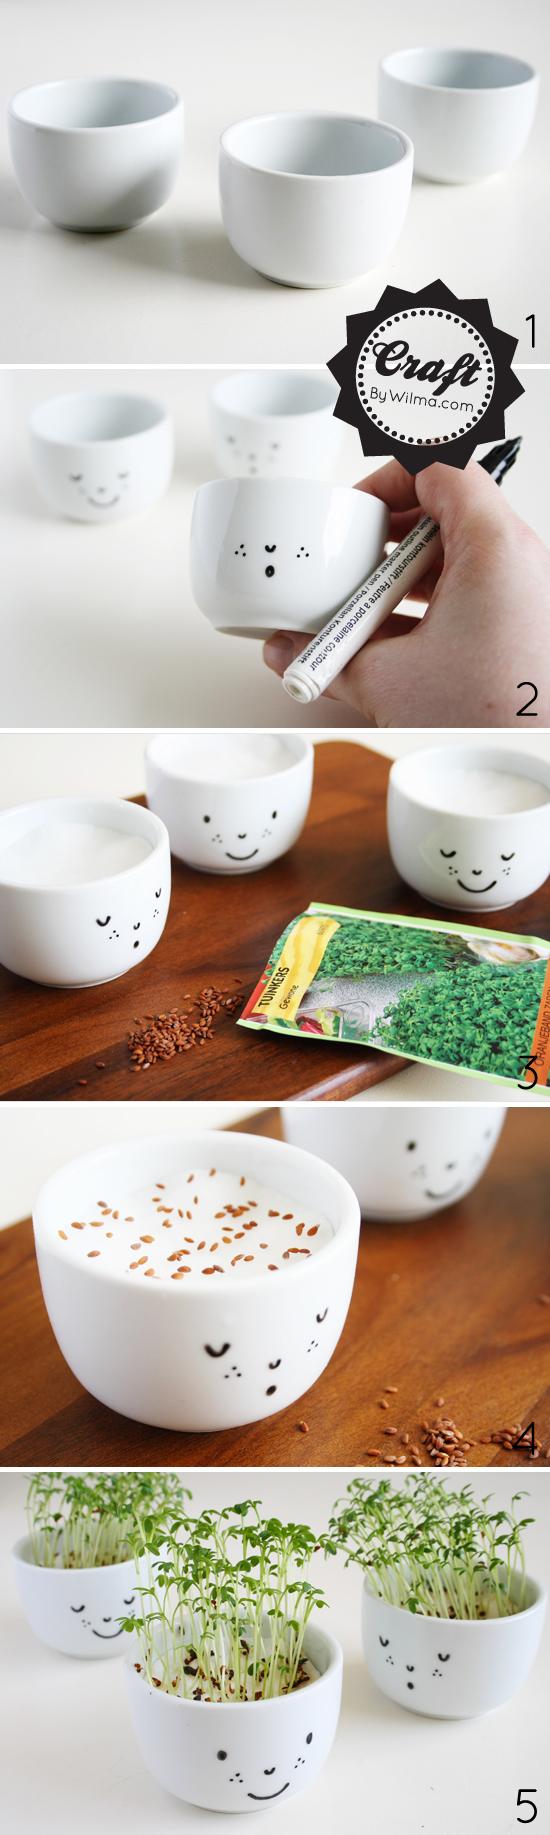 DIY watercress cups